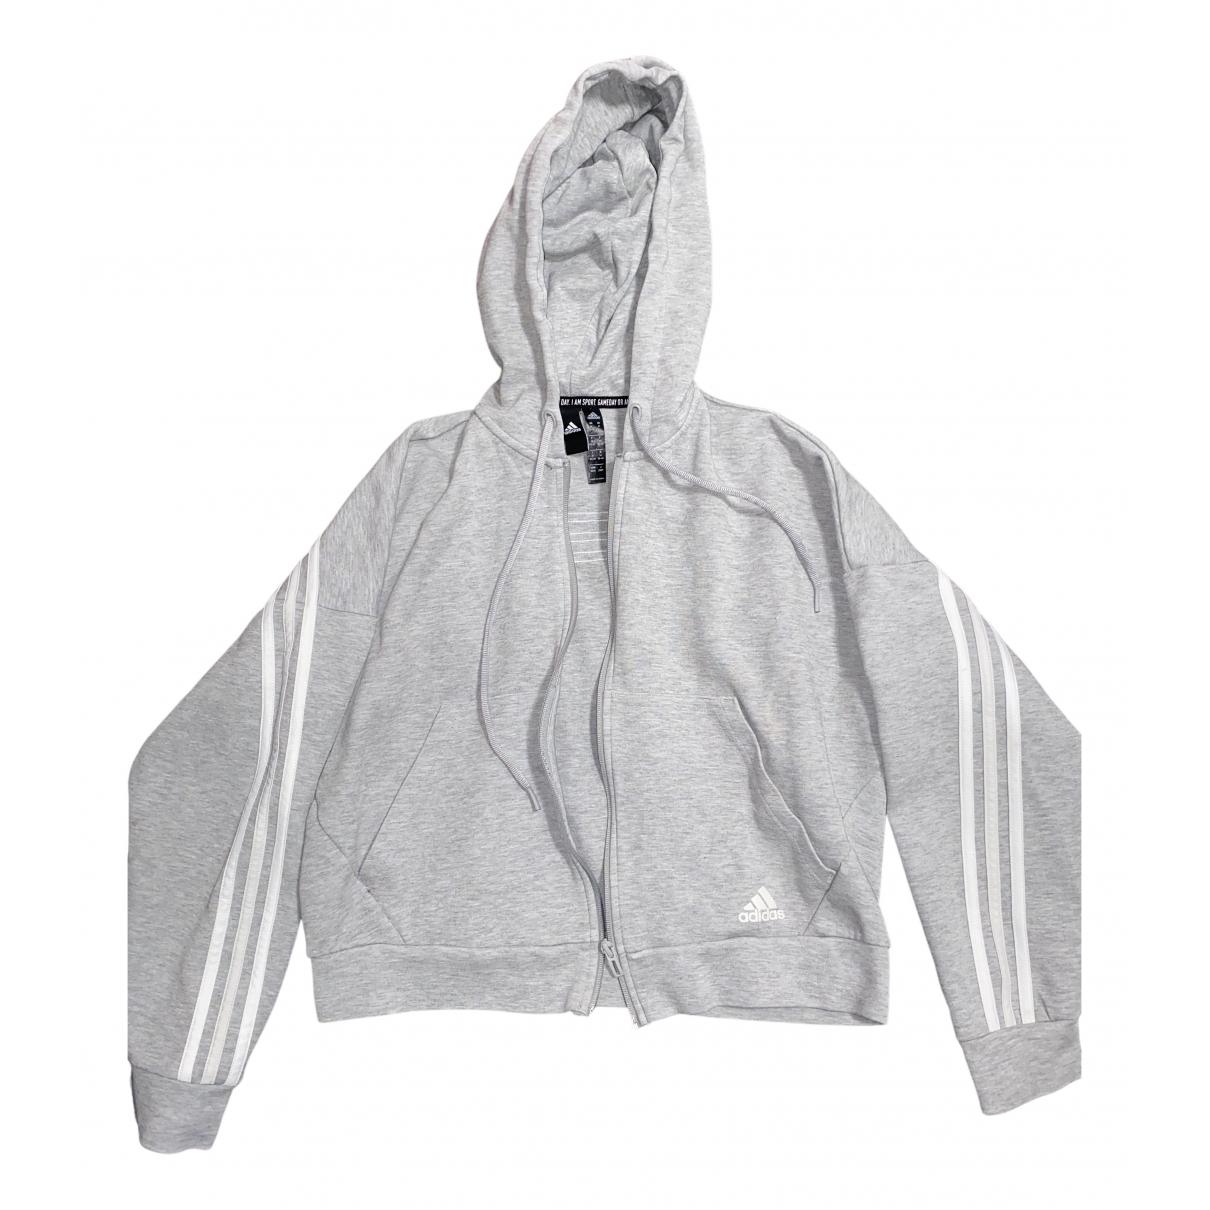 Adidas \N Grey Cotton jacket for Women M International